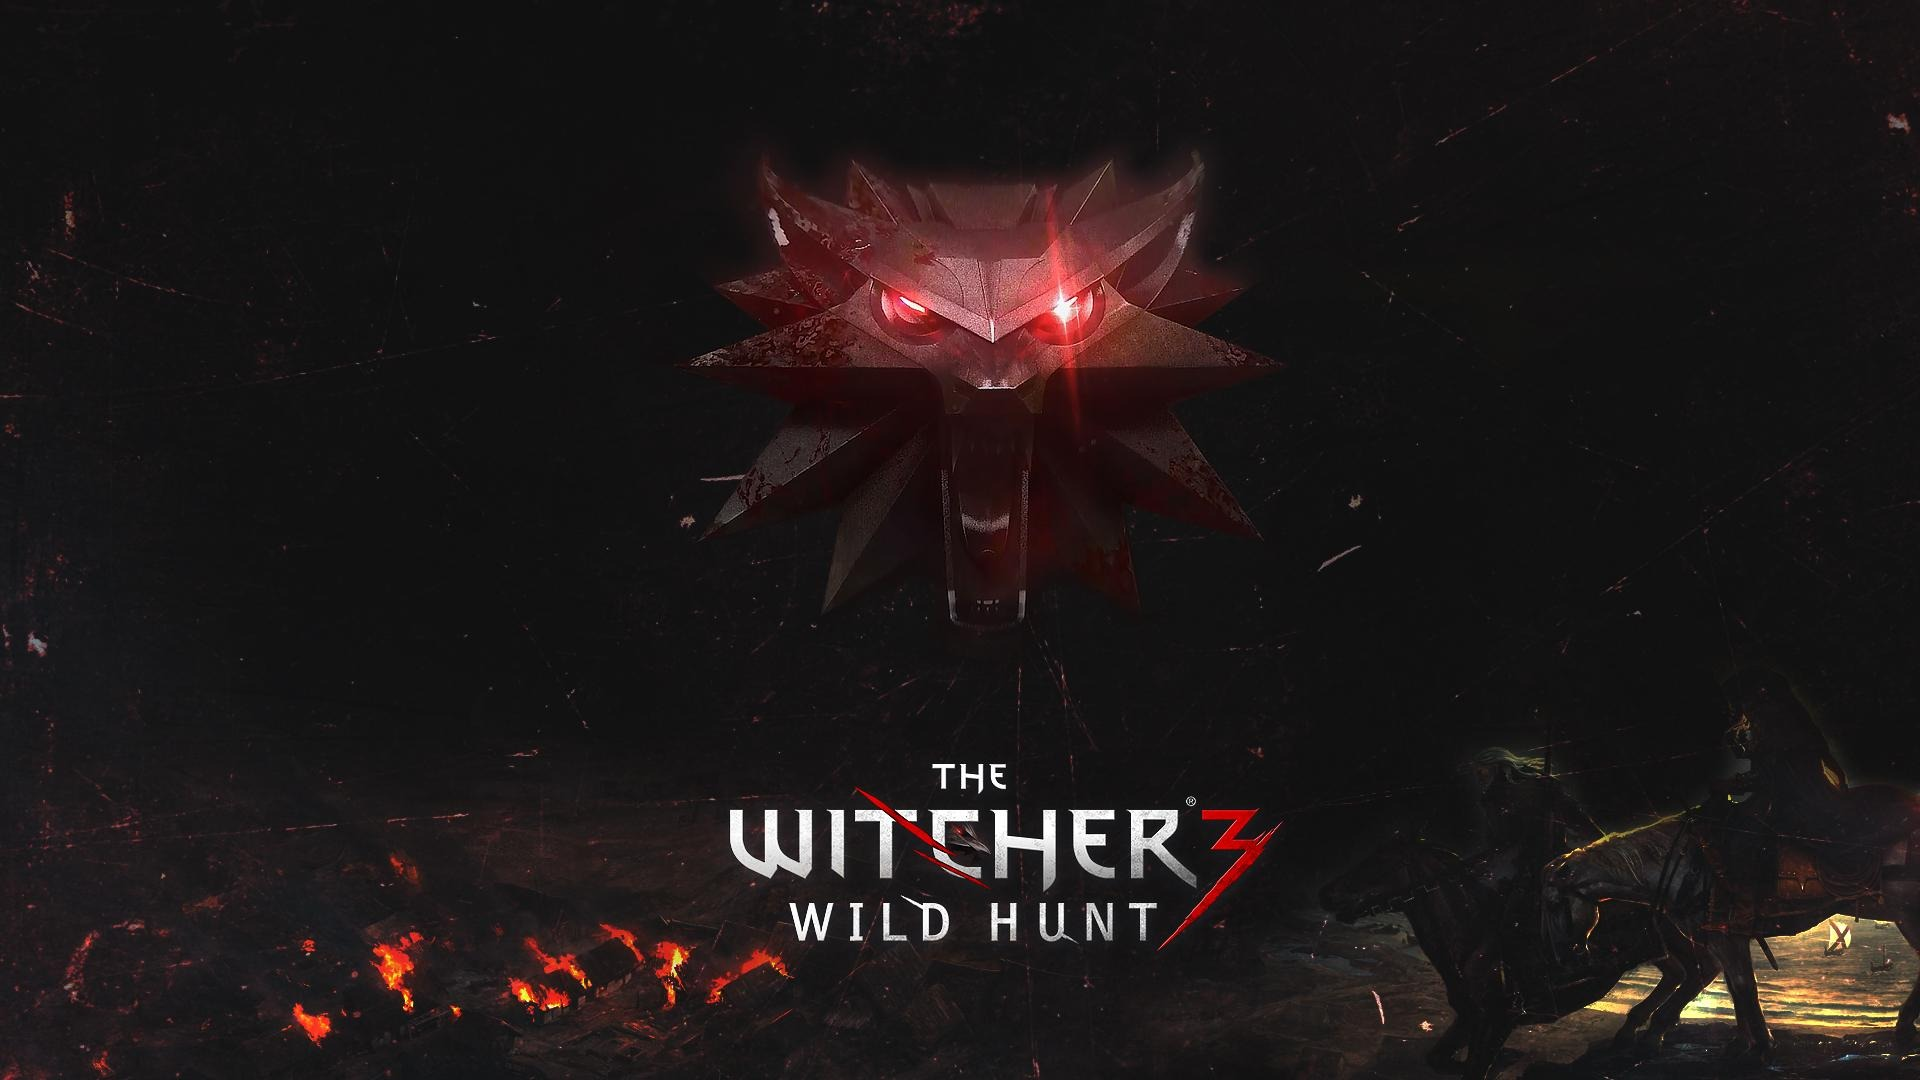 The witcher 3 wild hunthd 10wallpaper 1920x1080 voltagebd Images